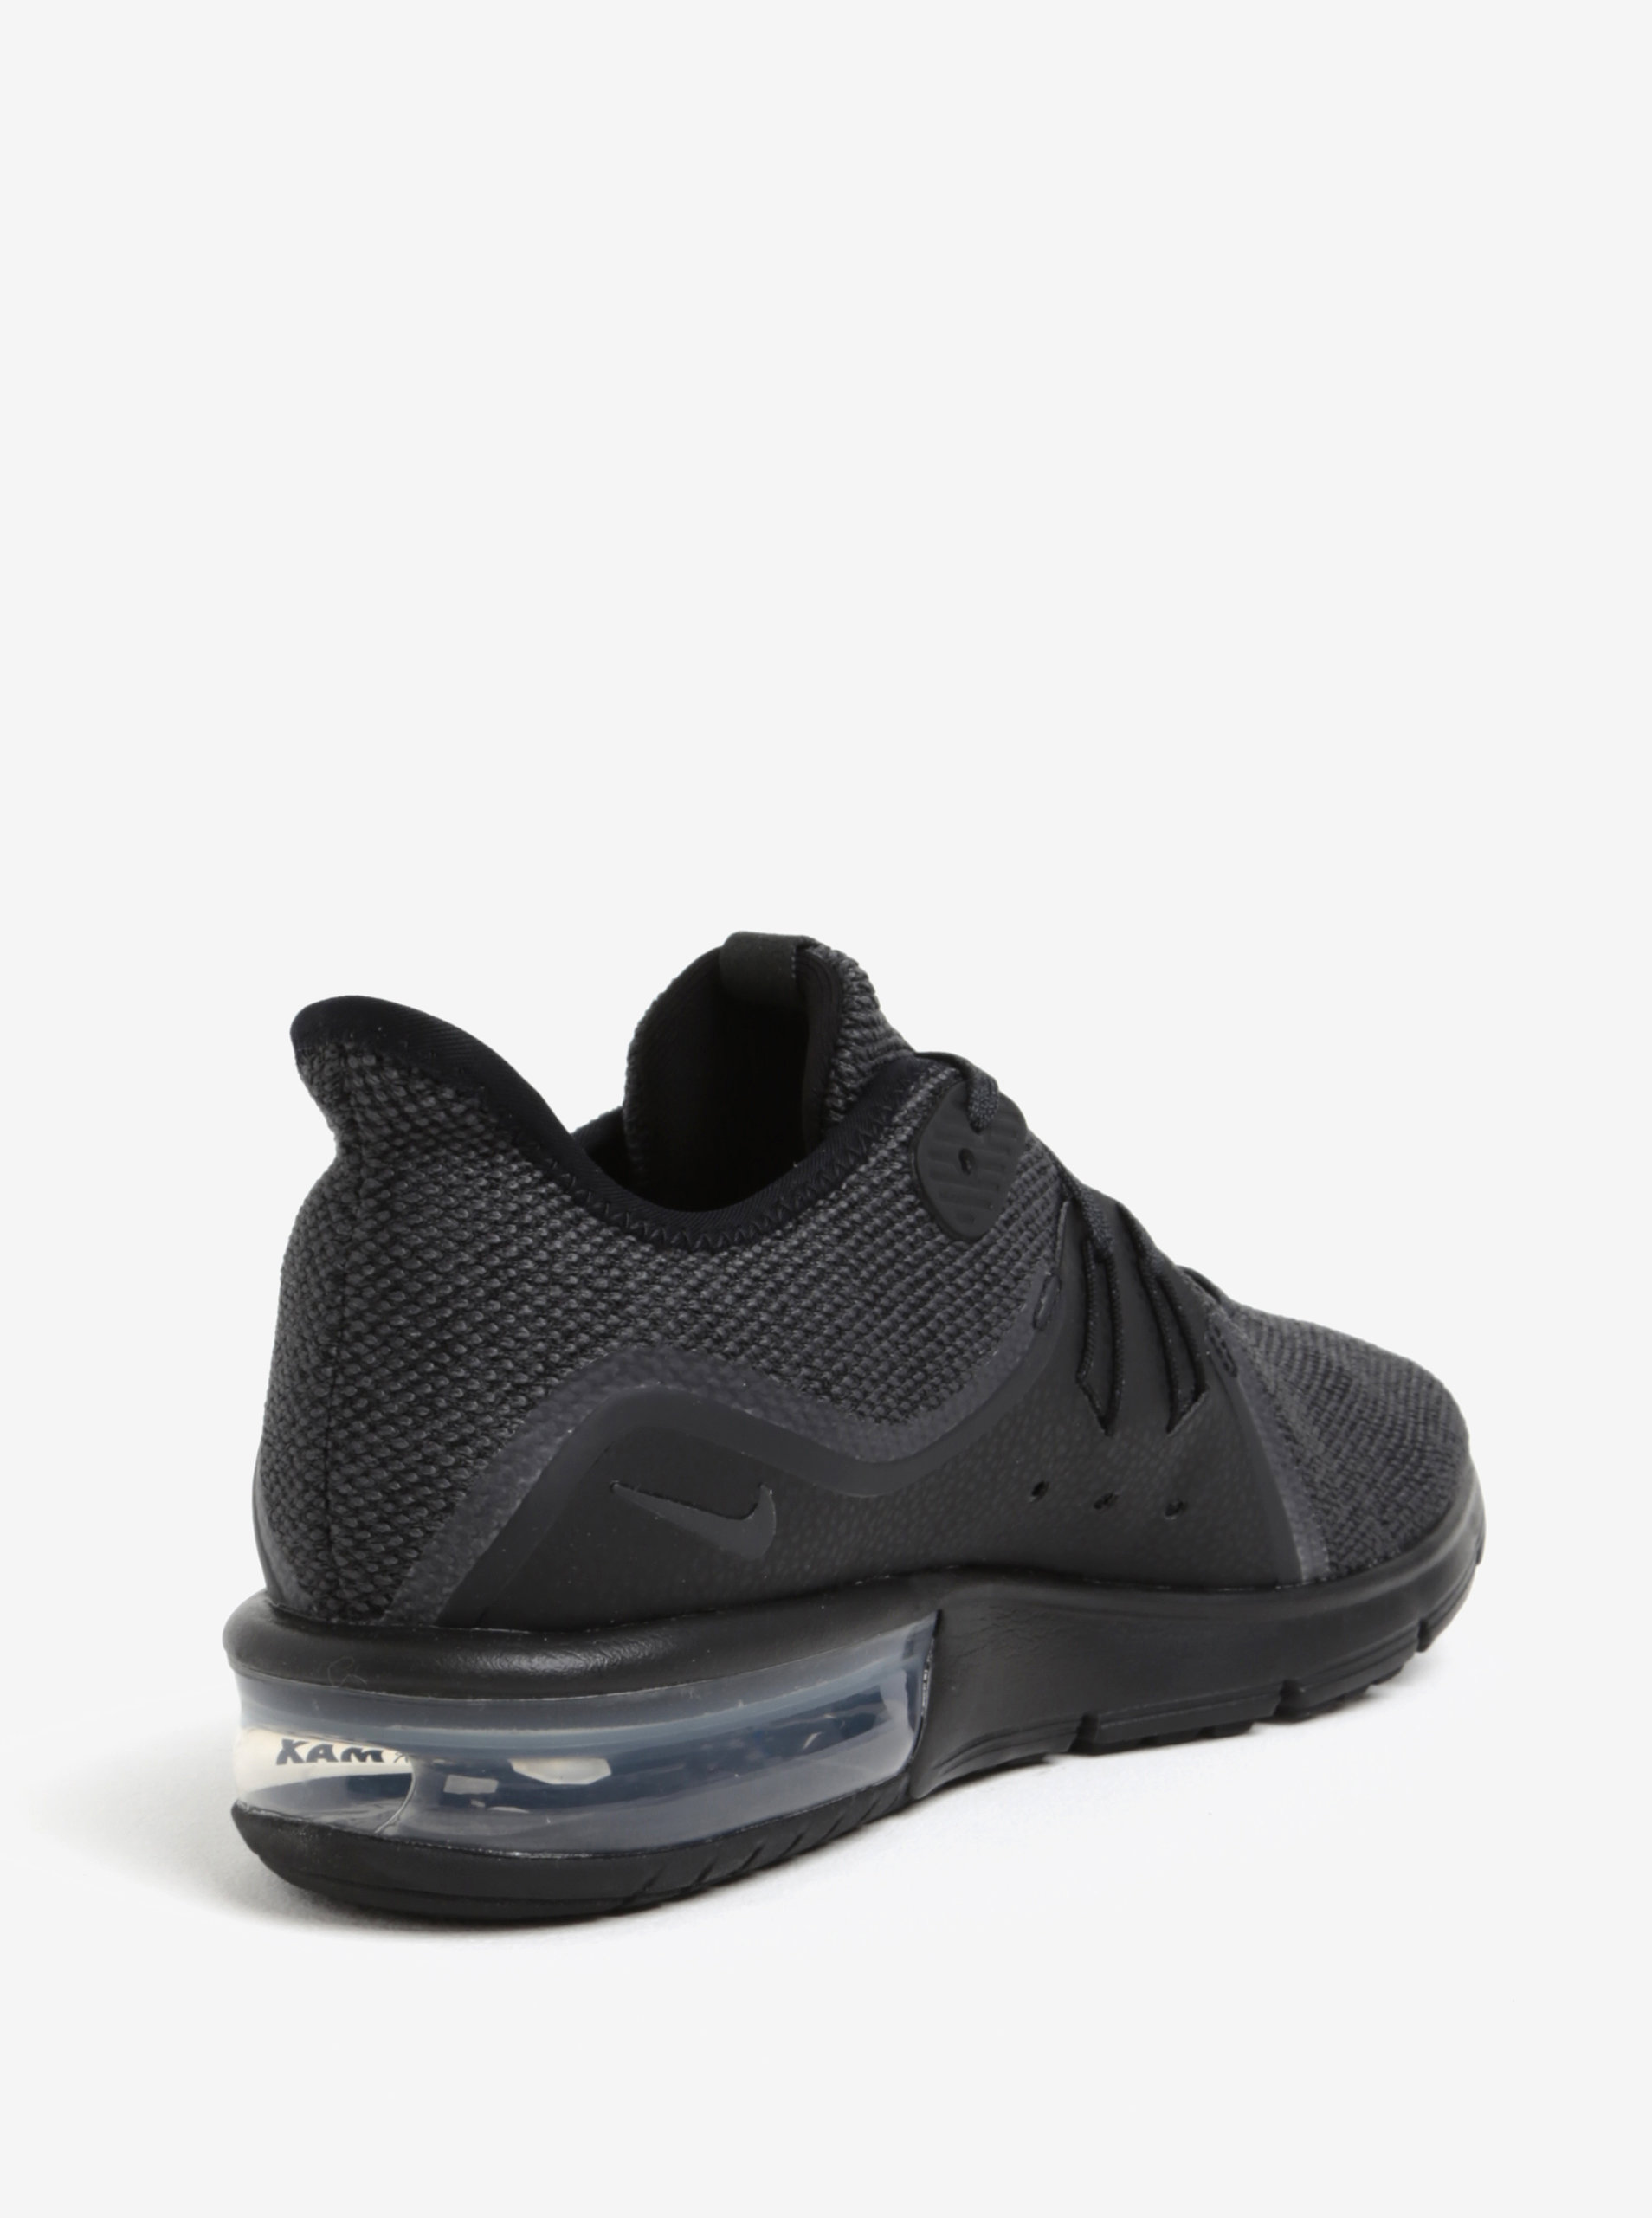 Čierne pánske tenisky Nike Air Max Sequent 3 Running Shoe ... 56c8f026085